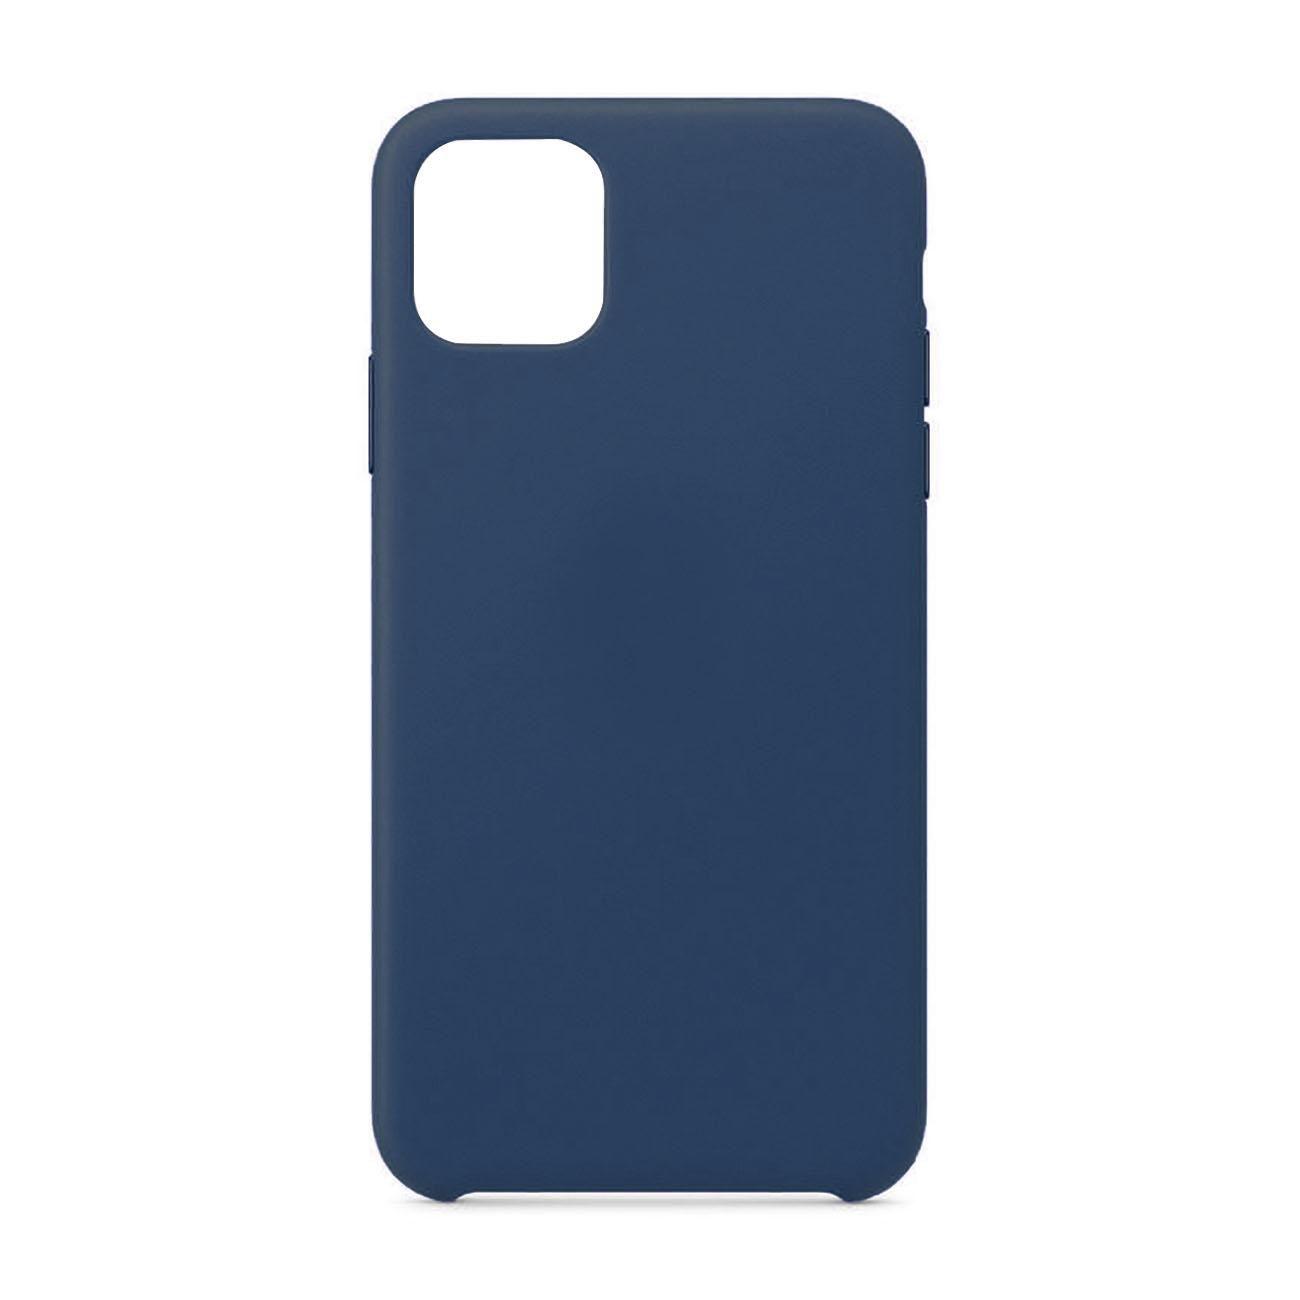 Reiko Apple iPhone 11 Pro Gummy Cases In Navy